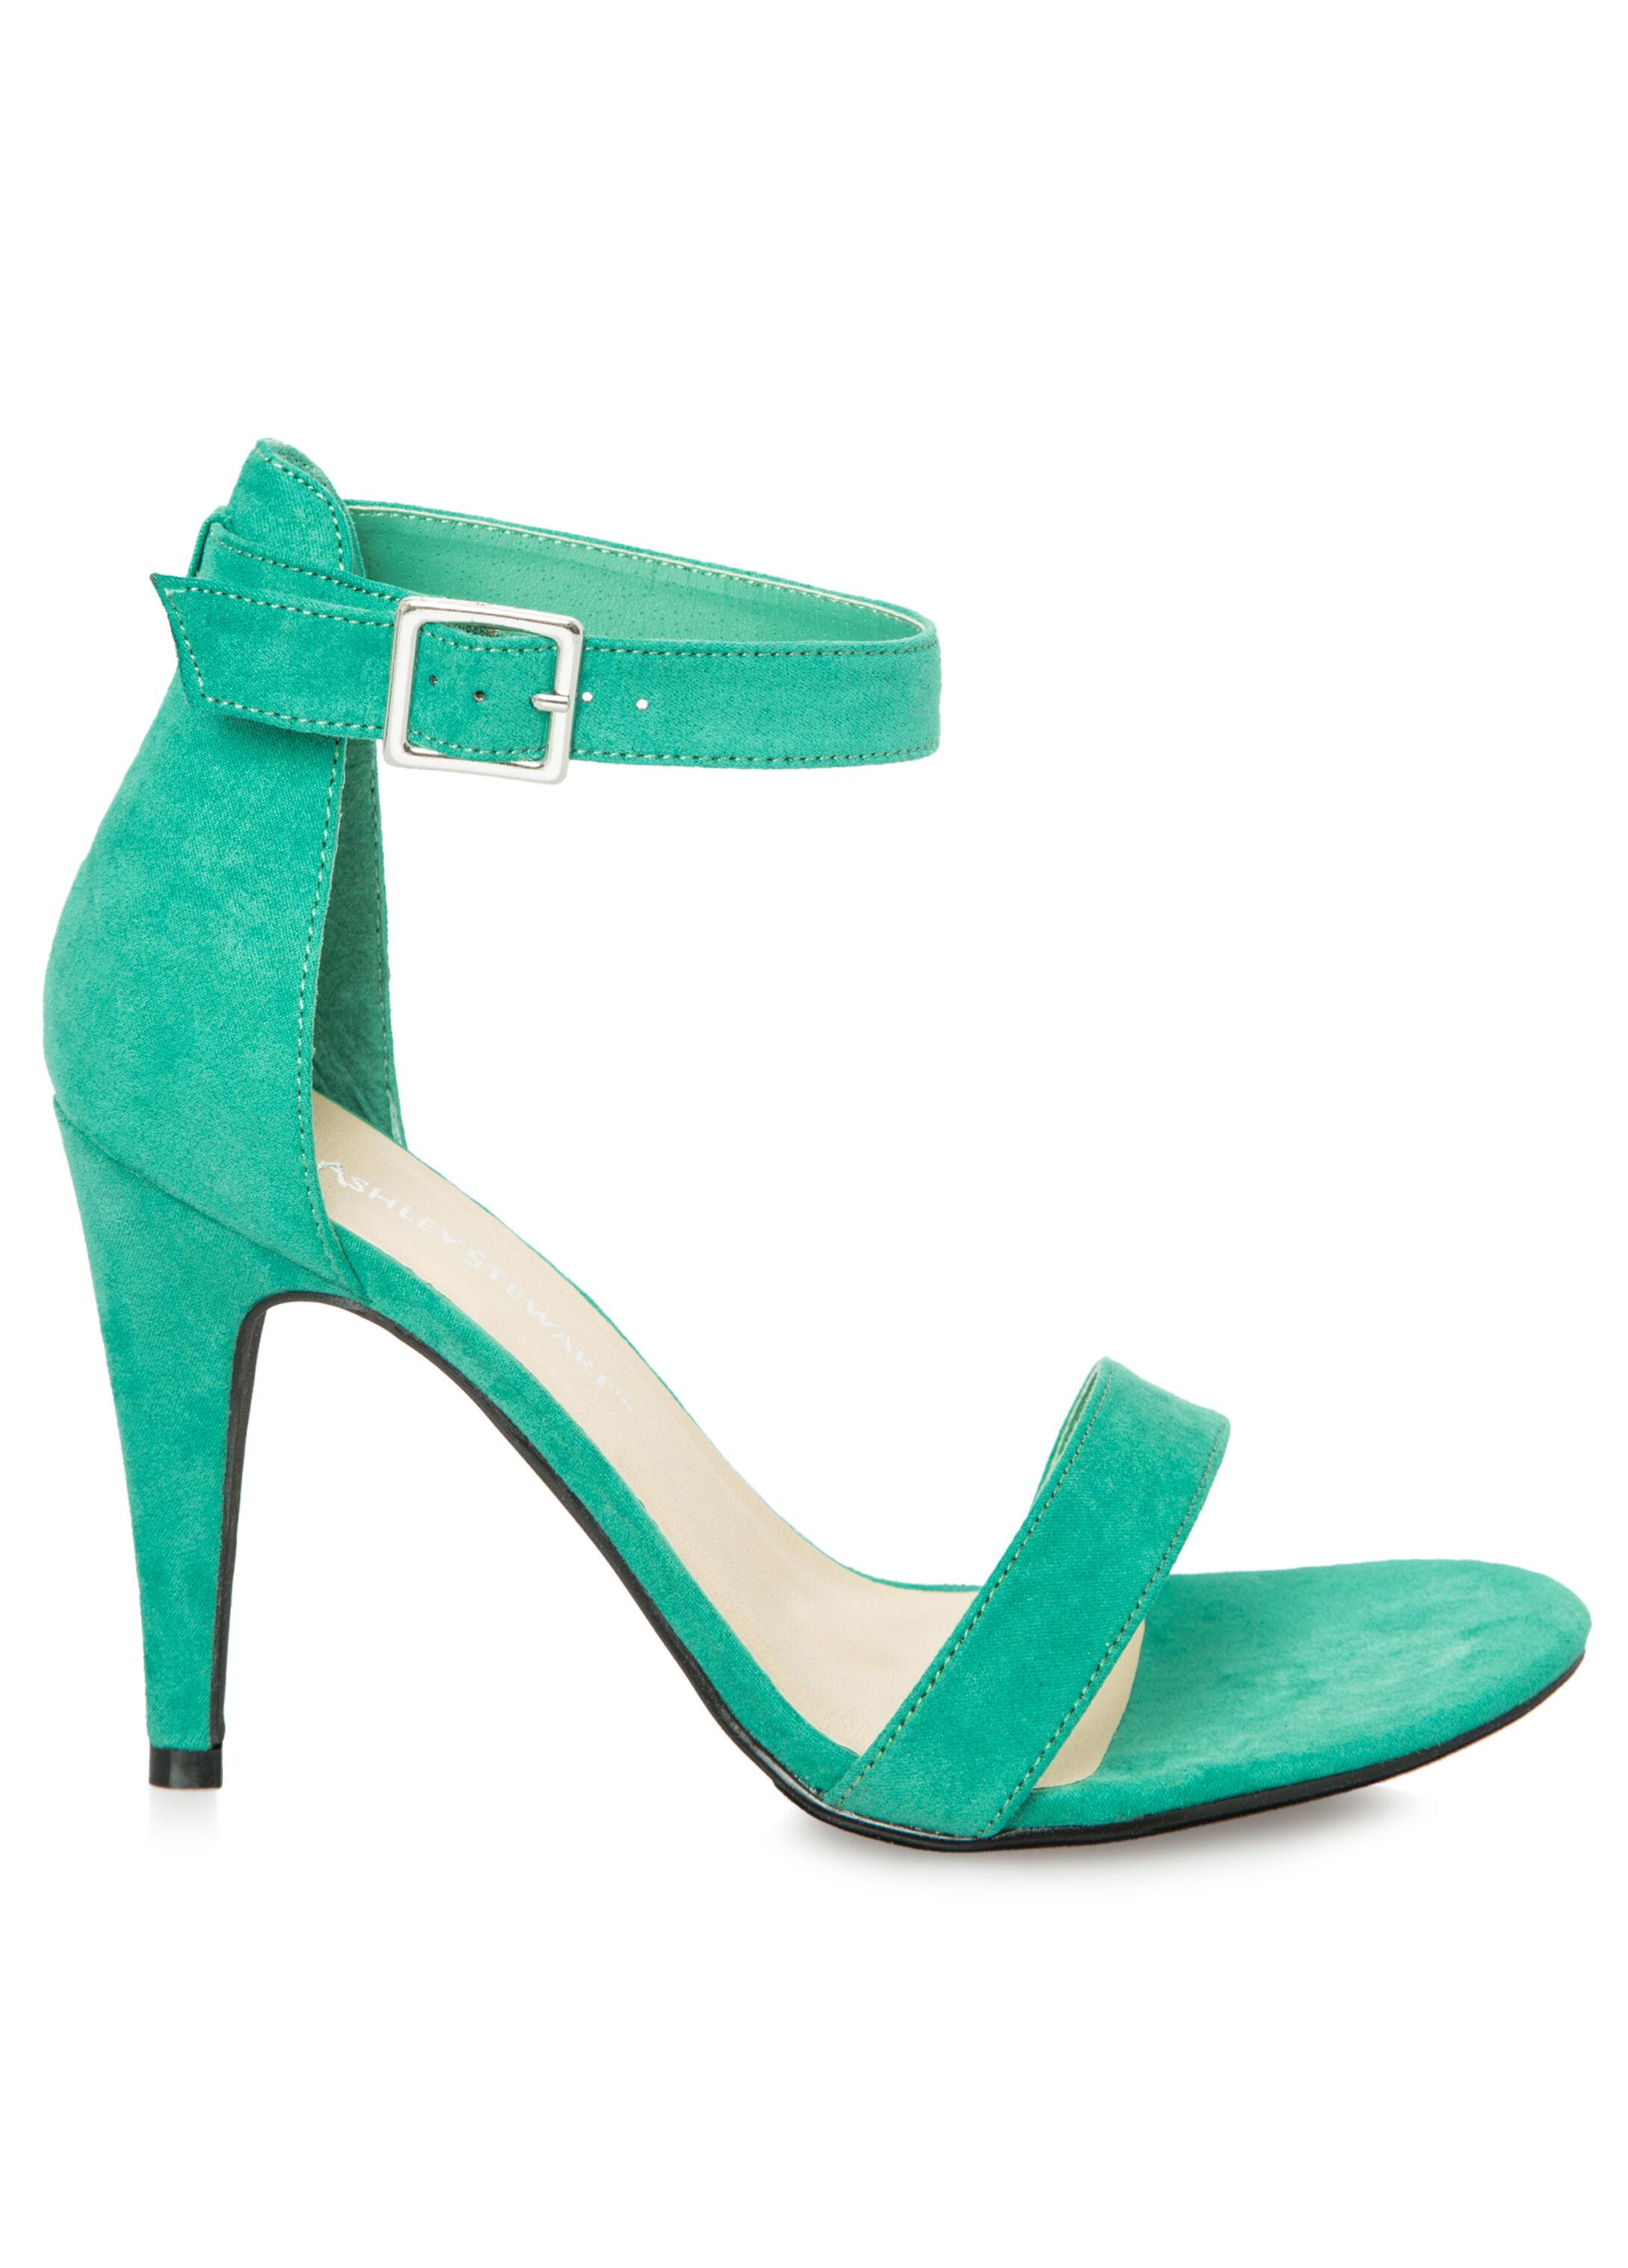 Micro Suede Dress Sandal - Wide Width